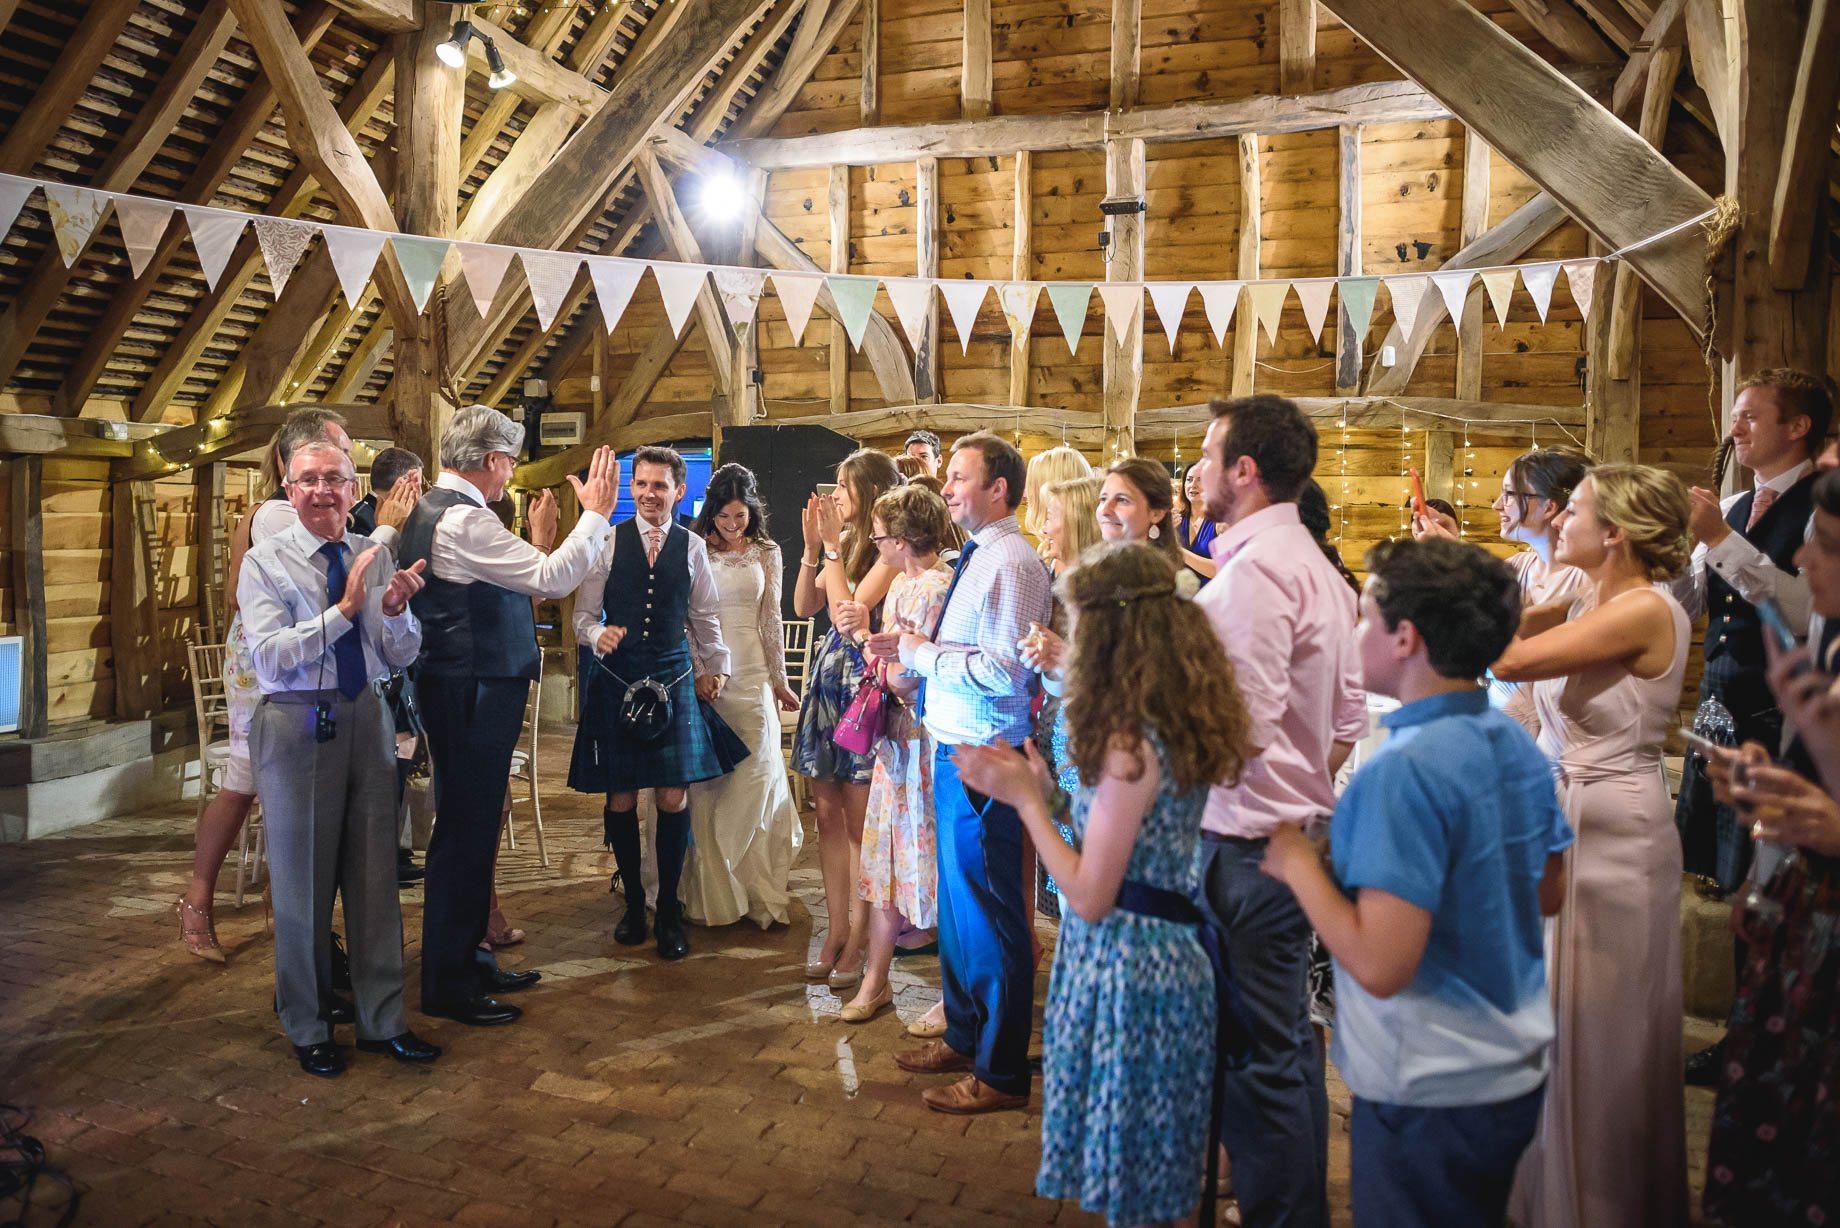 Gildings Barn wedding photography - Sarah and Steve (175 of 190)